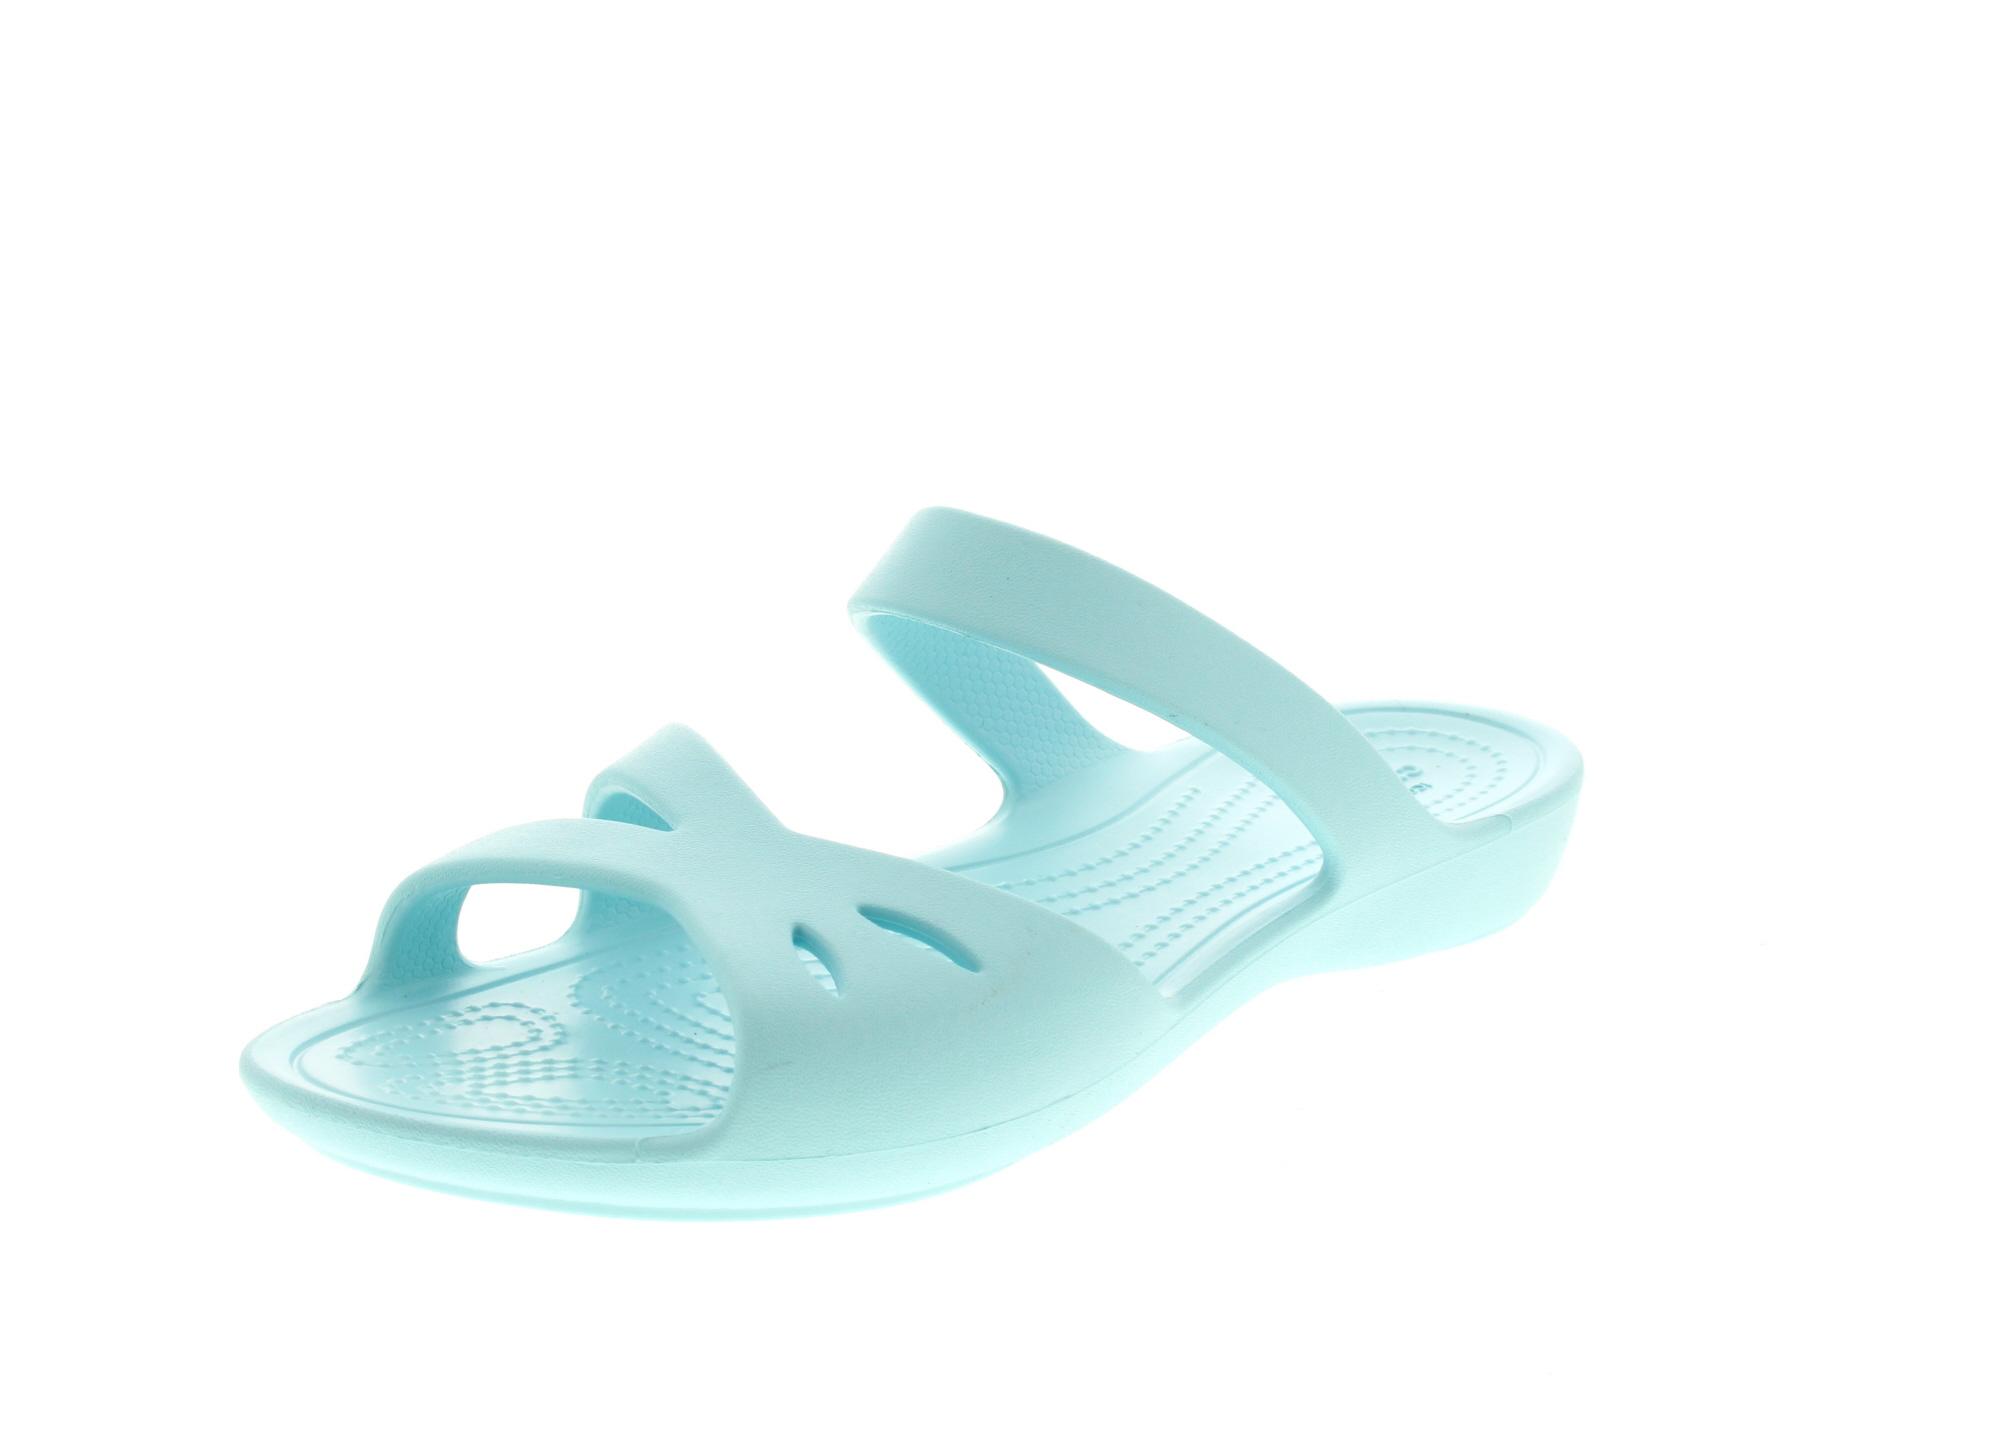 CROCS Schuhe - Pantoletten KELLI OL SANDAL - ice blue0